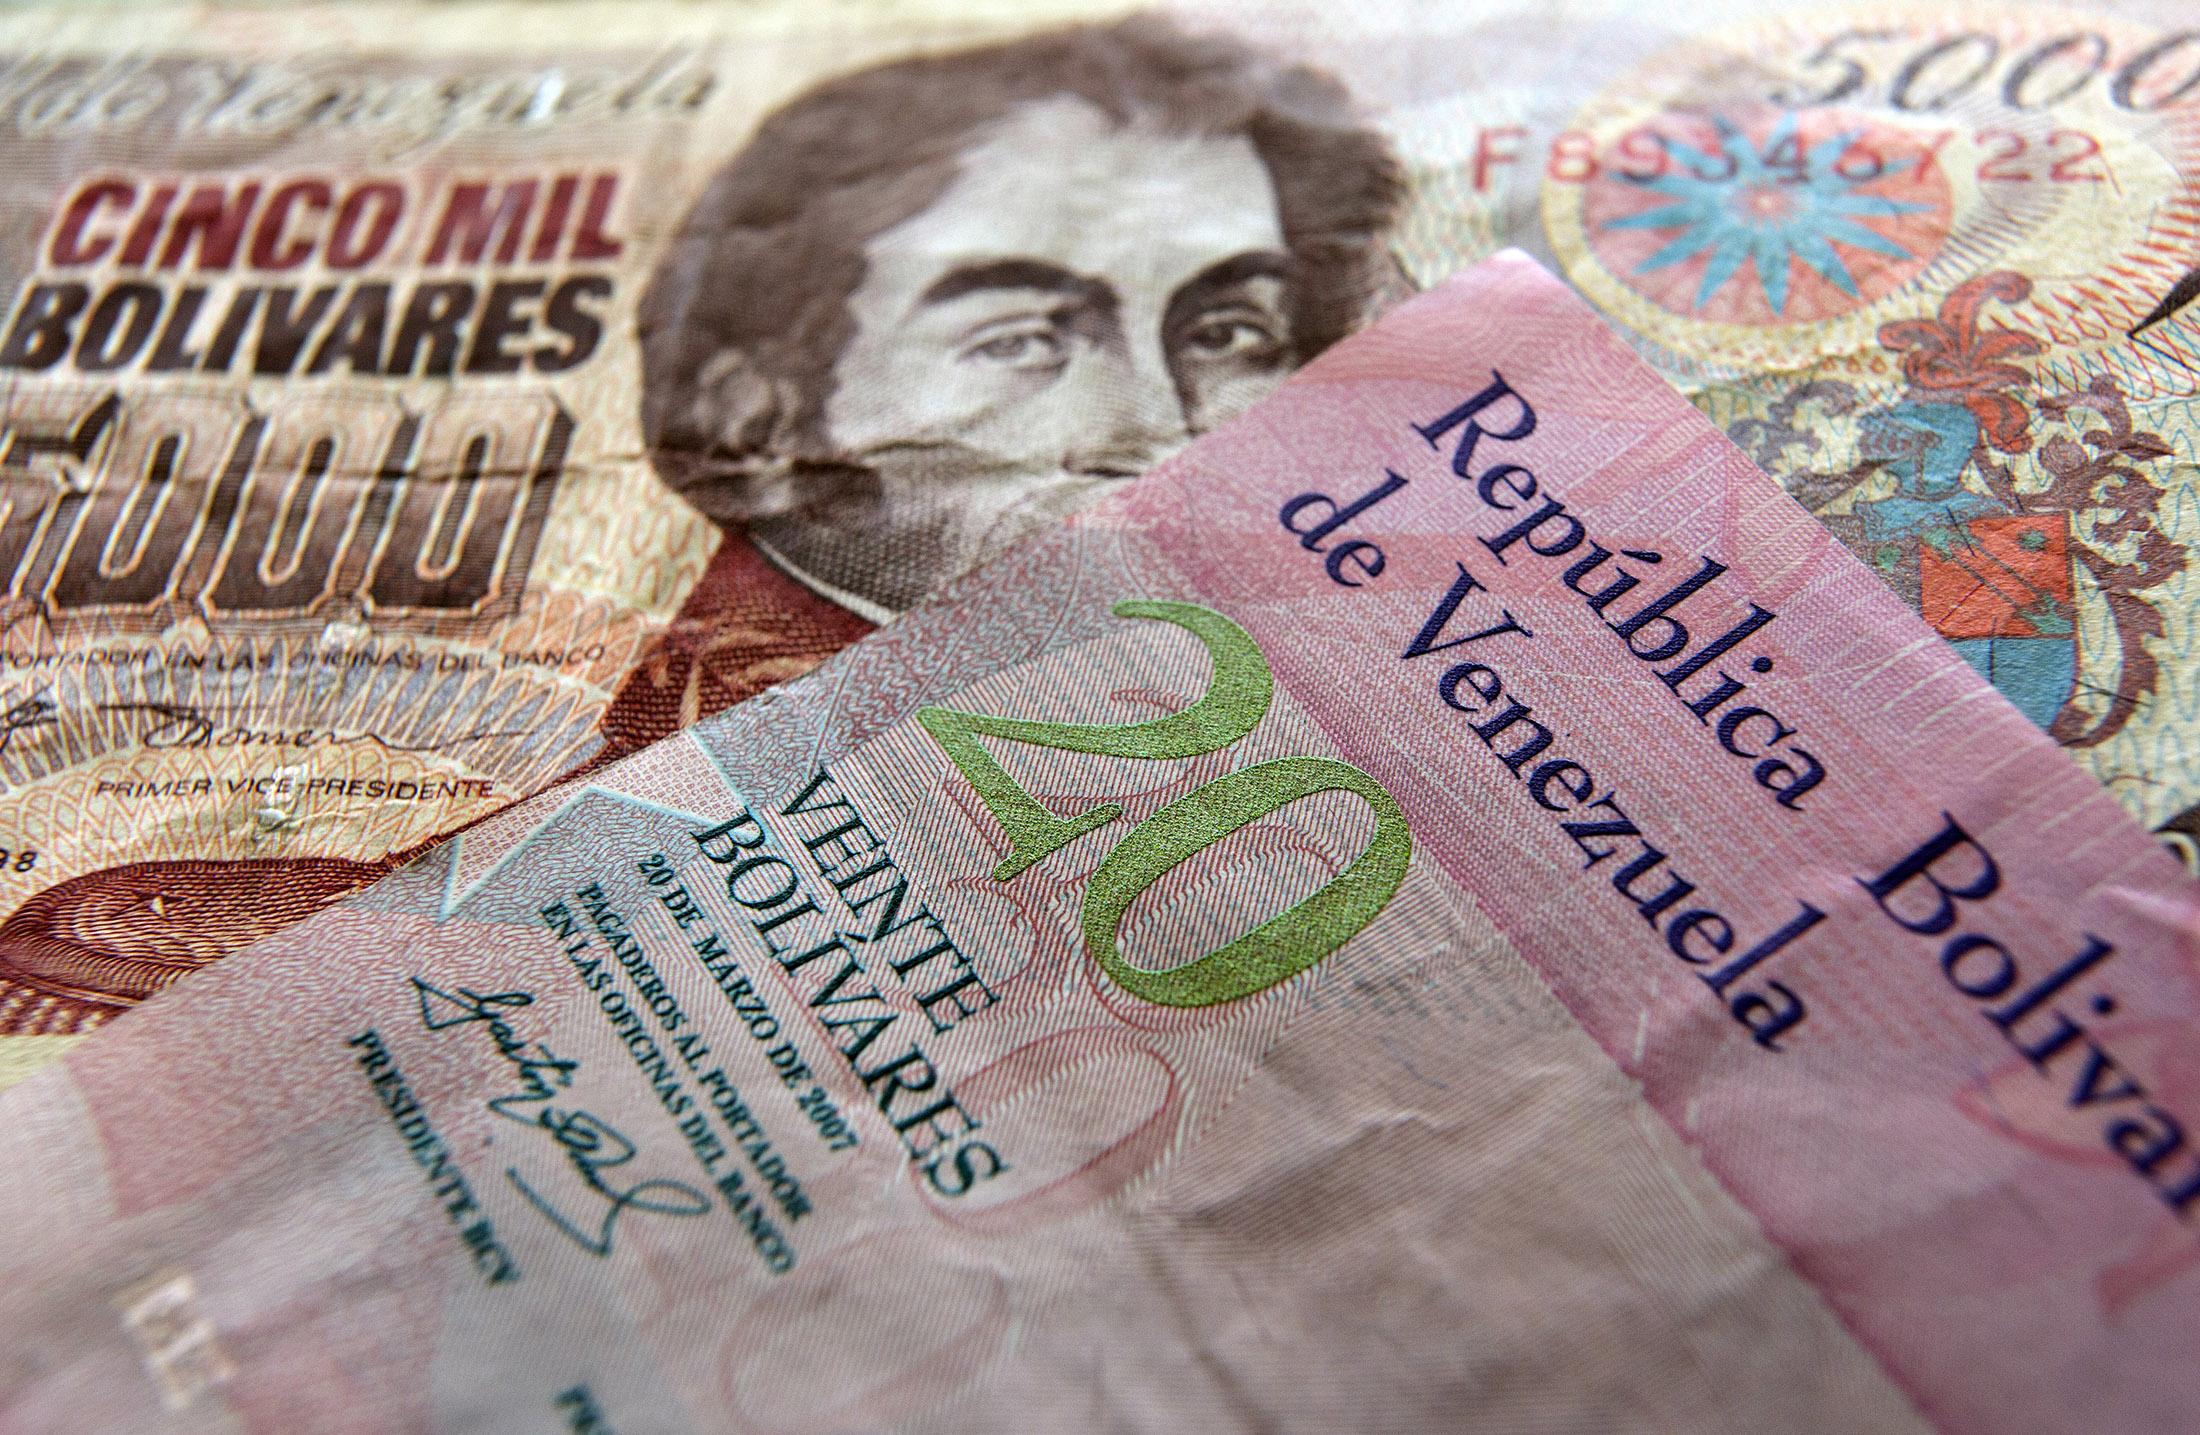 Black Market Bolivars Crash Past 1 000 Per Dollar In Venezuela Bloomberg